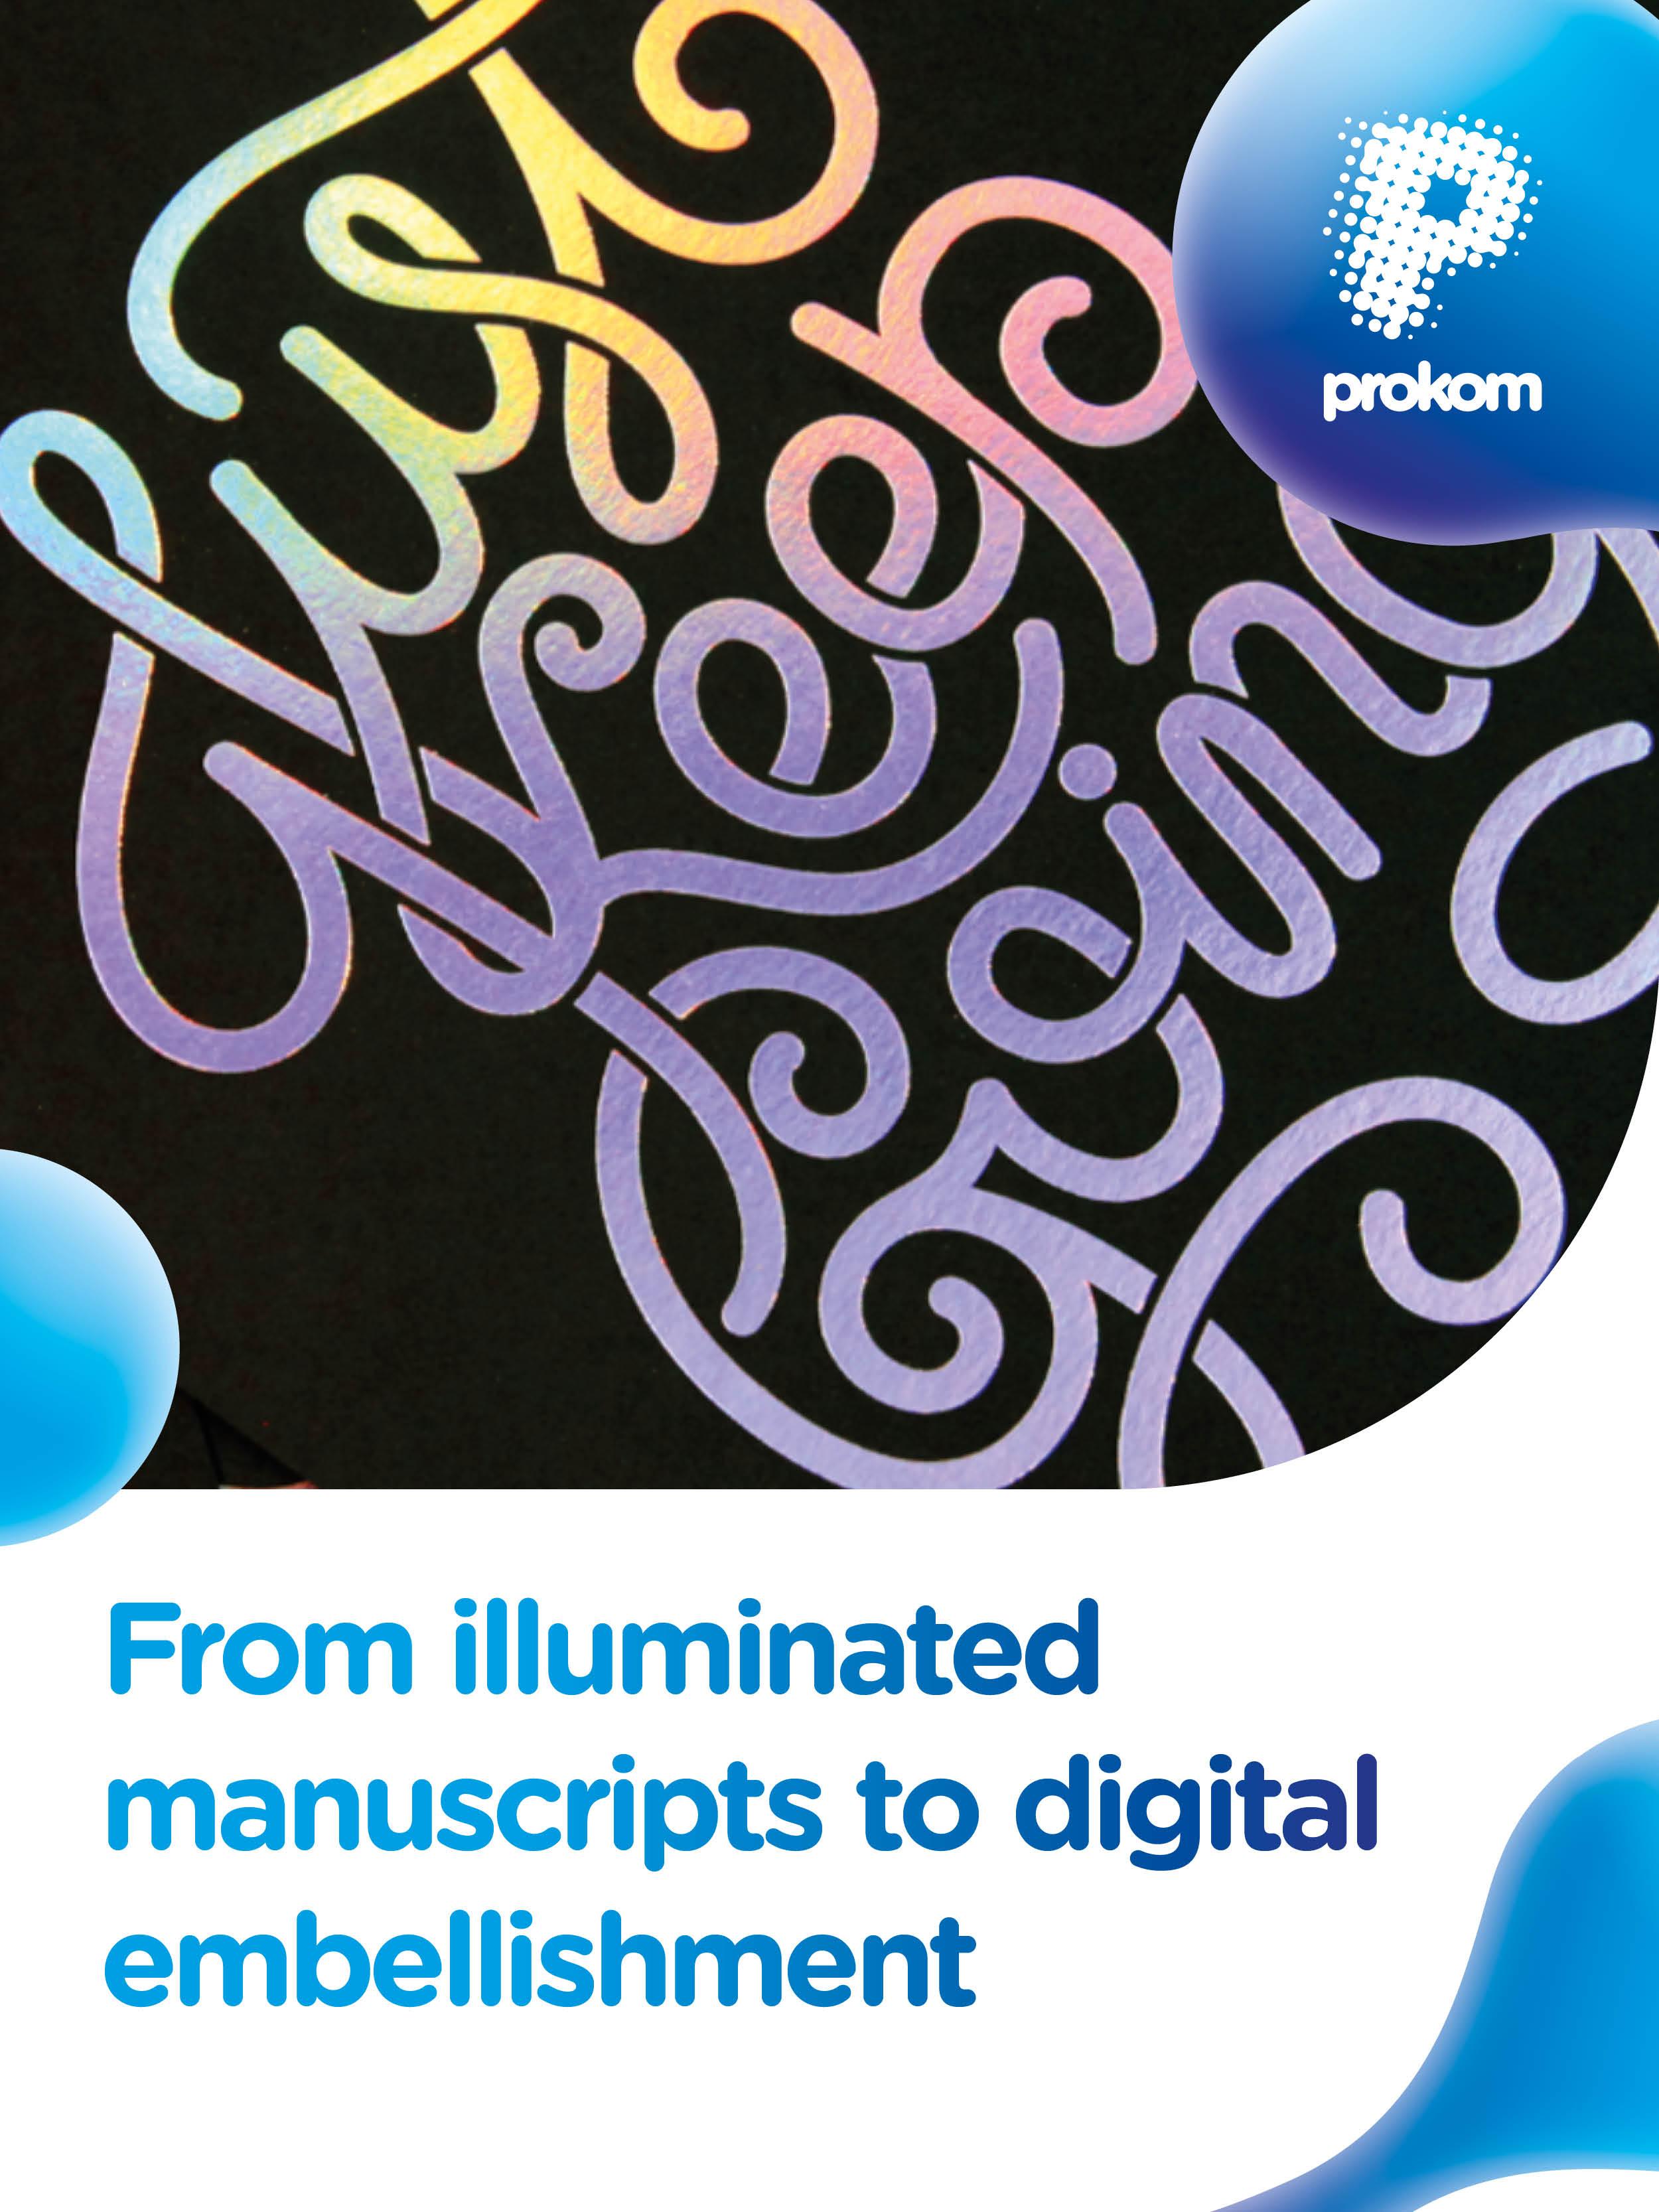 JetPro - from illuminated manuscripts to digital embellishment image